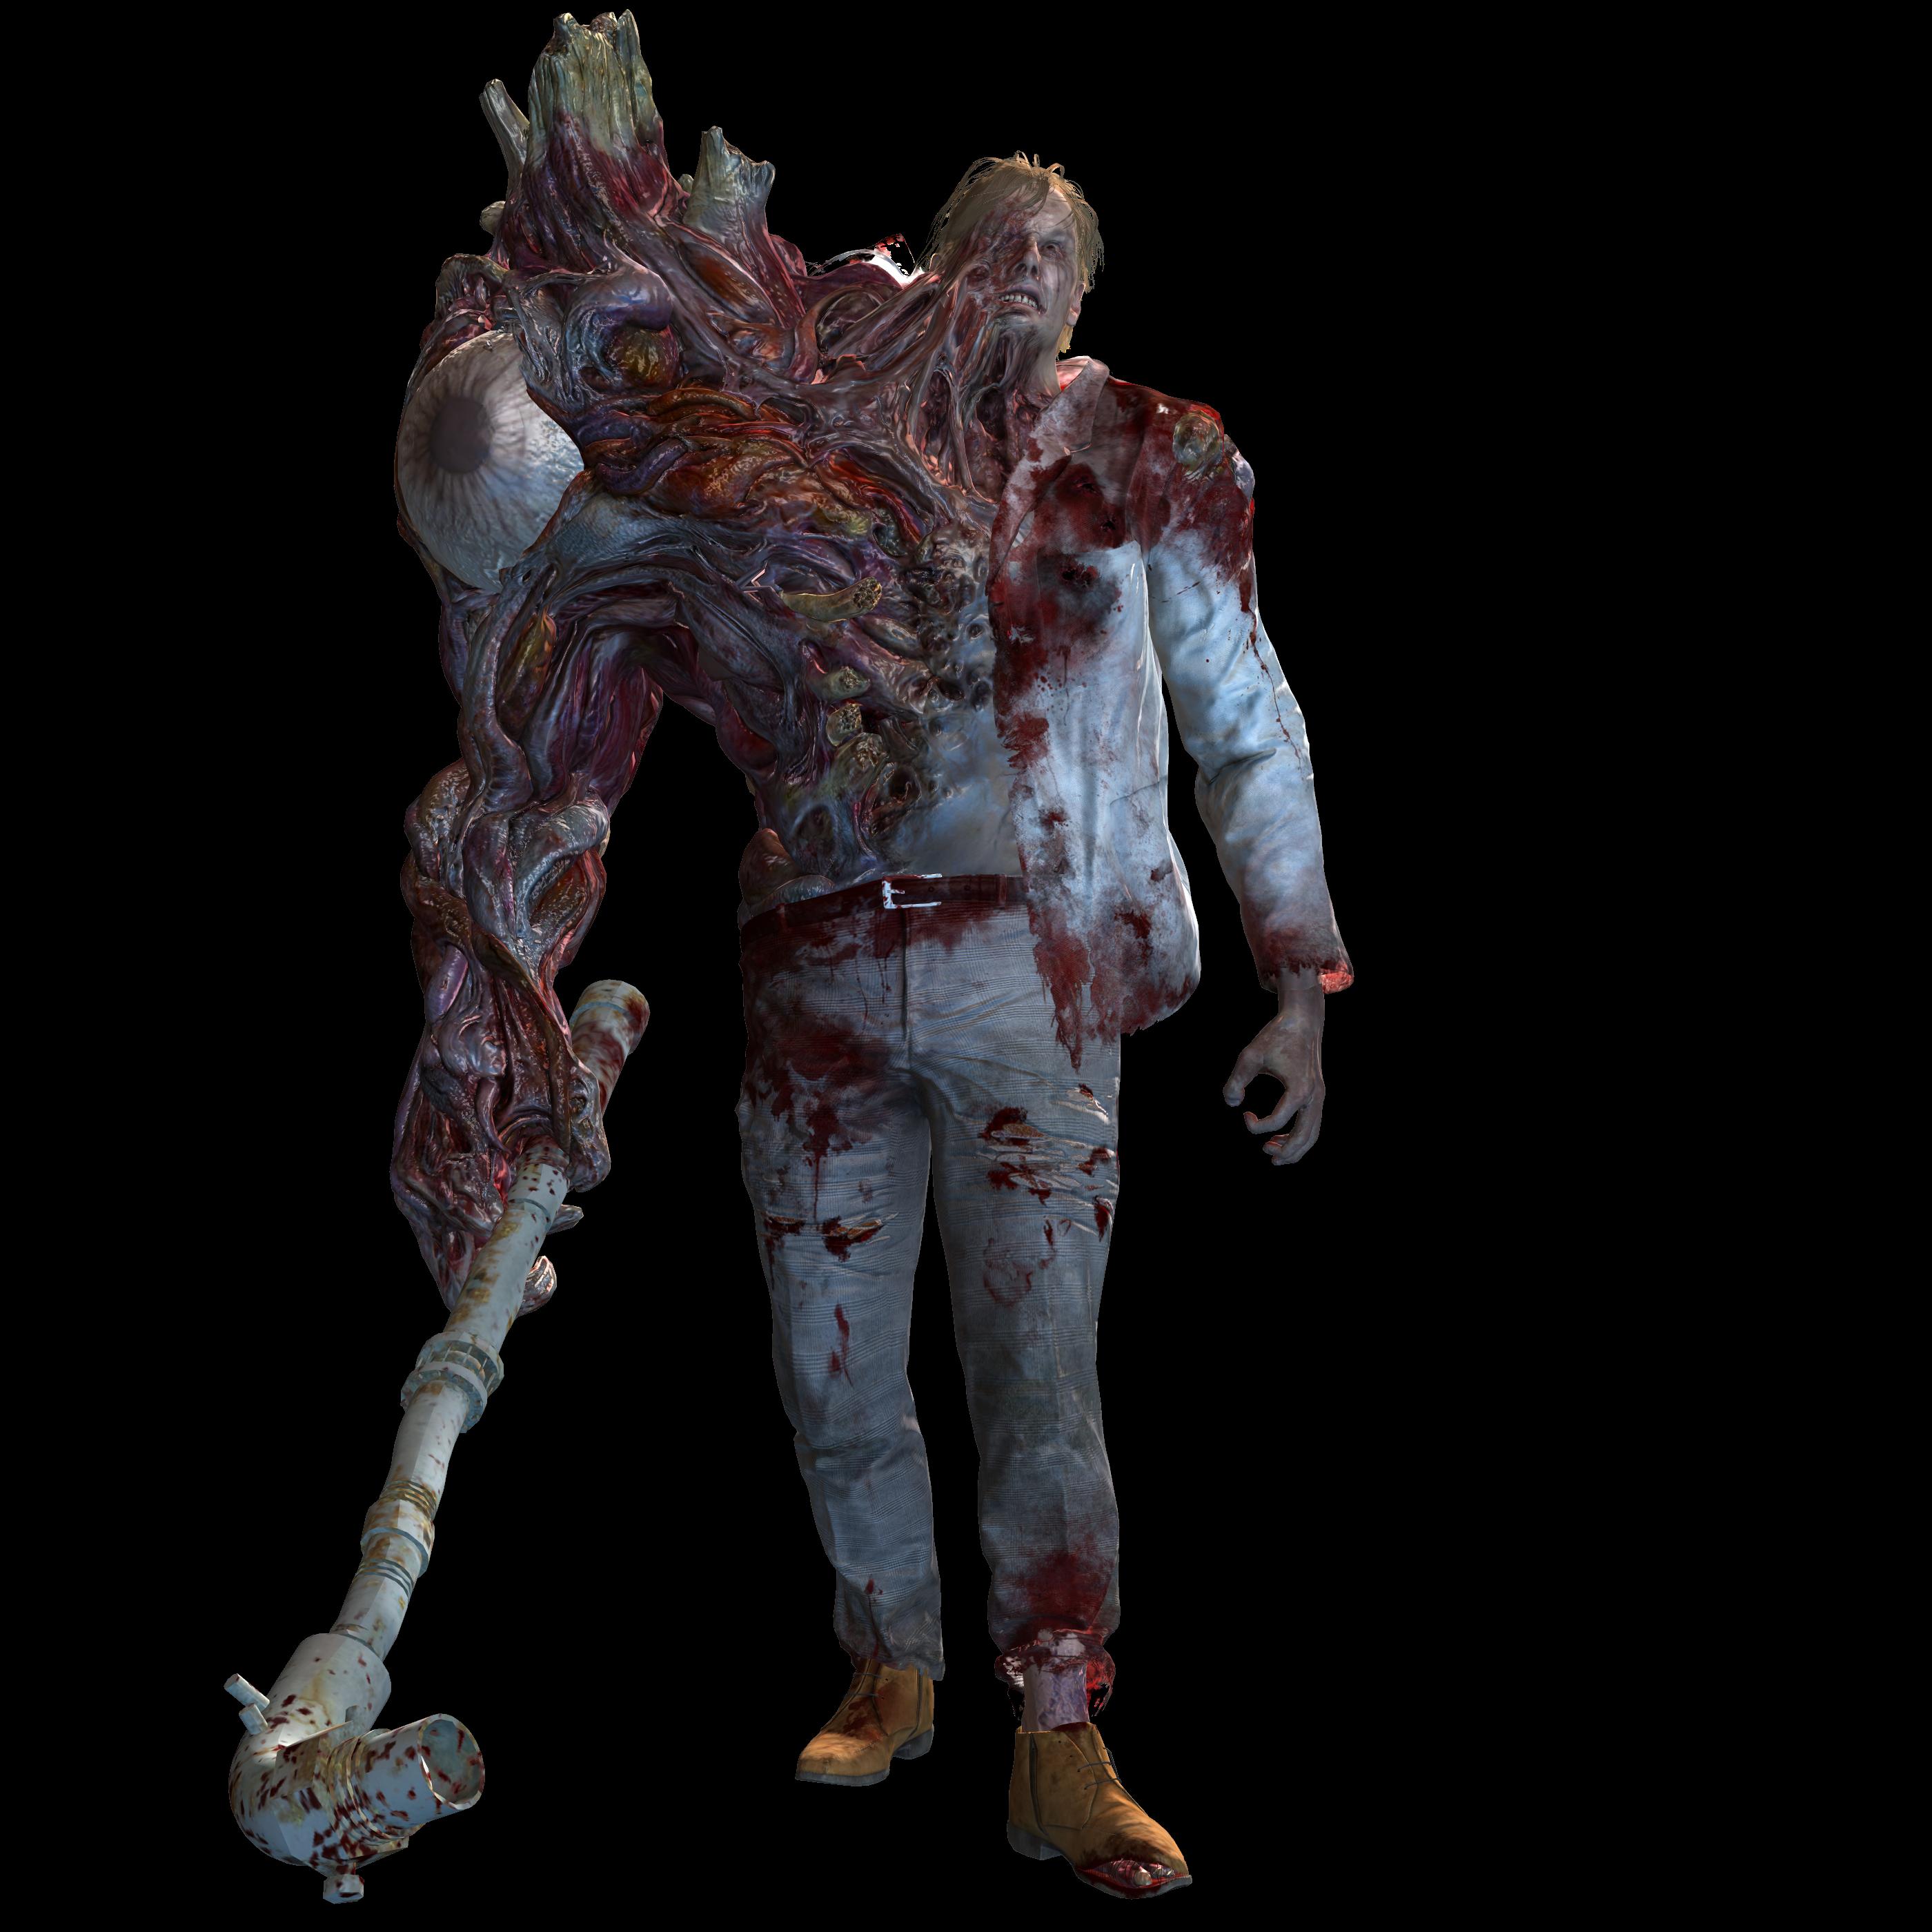 G Birkin Stage 1 Original Pose Resident Evil 2 By Tyrant0400tp